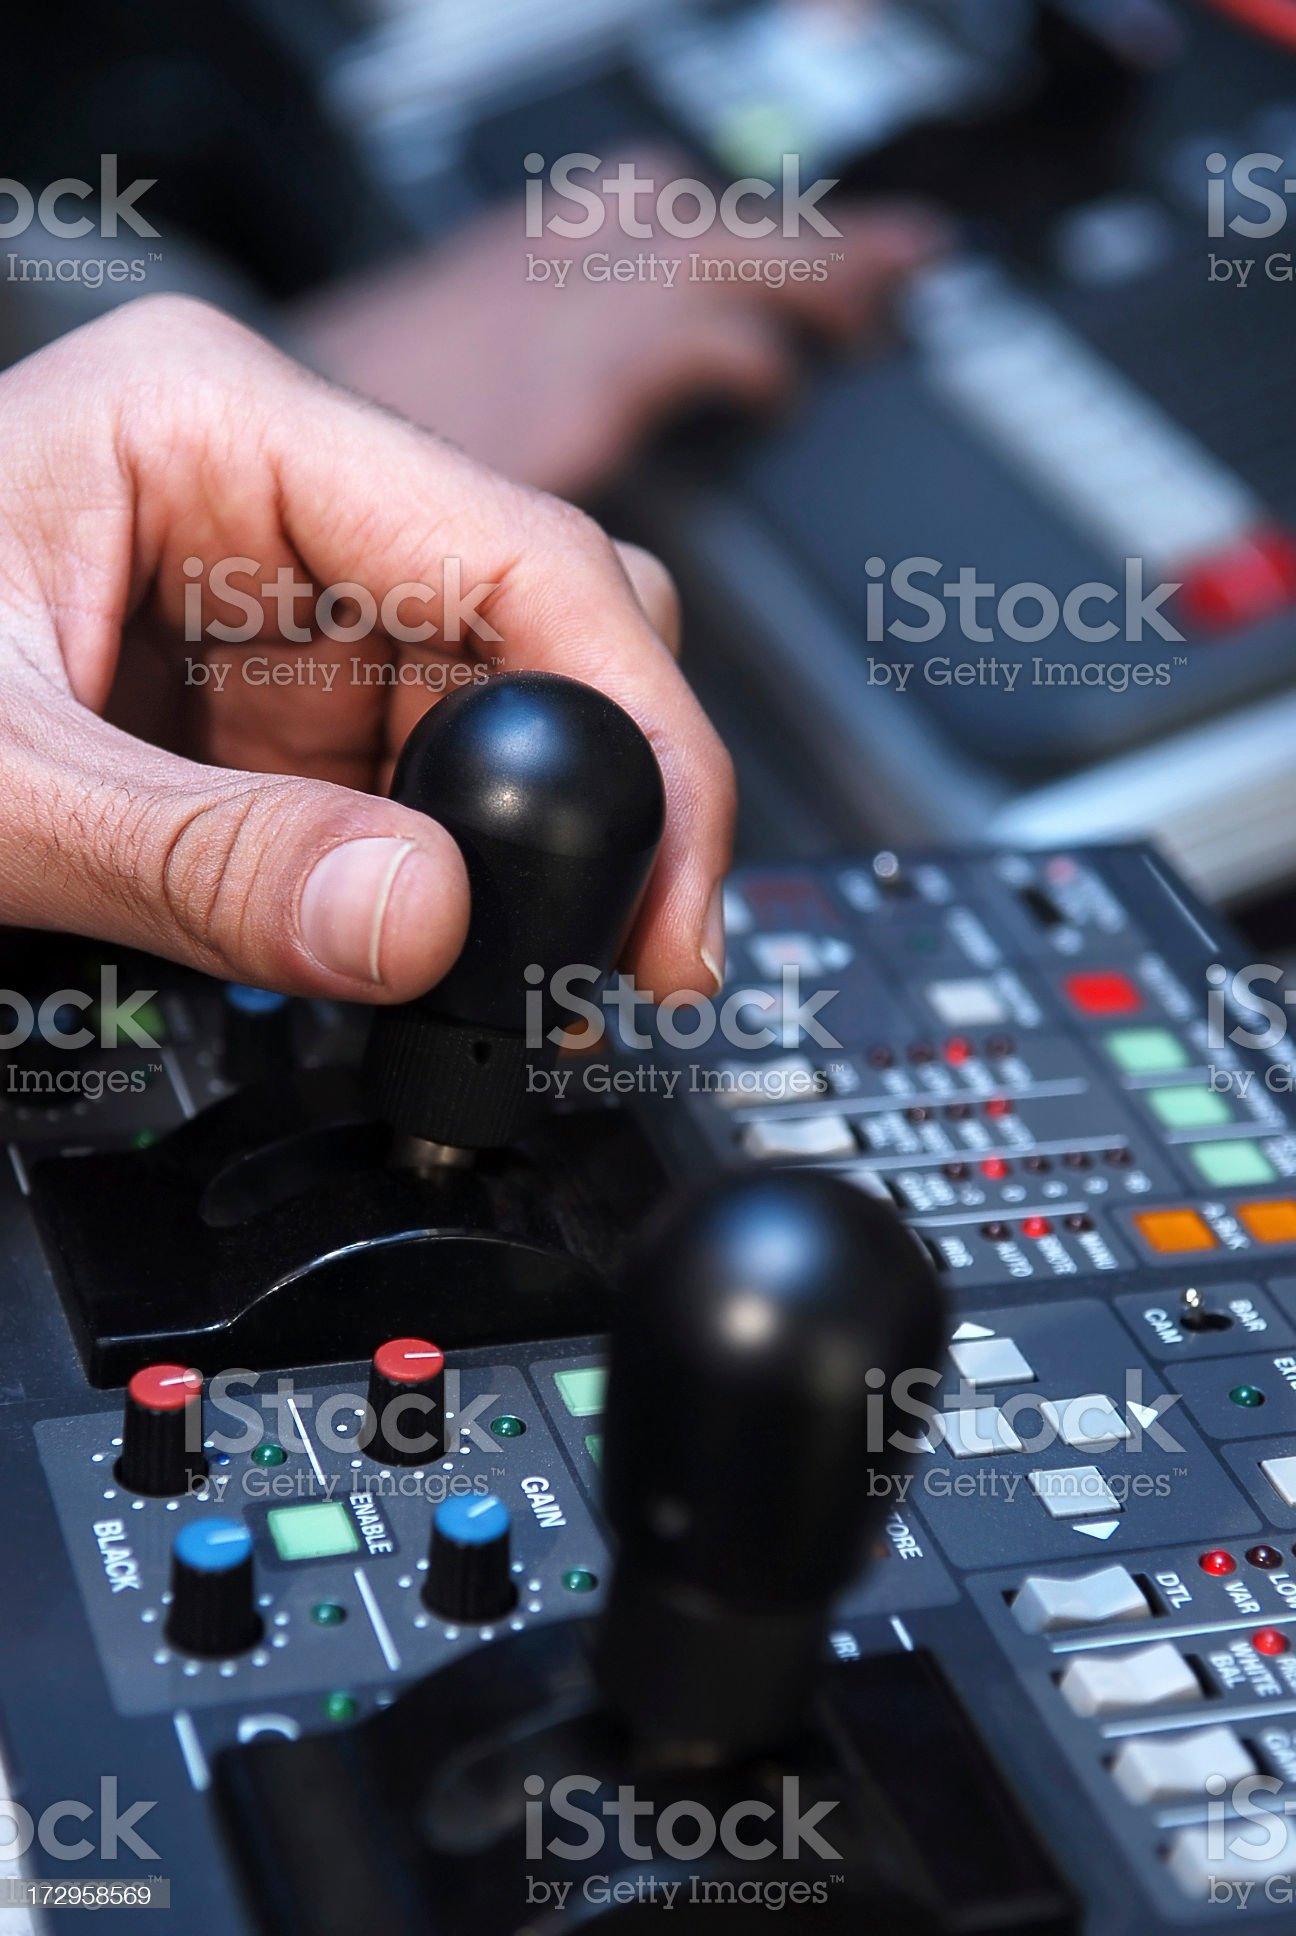 control panel series royalty-free stock photo